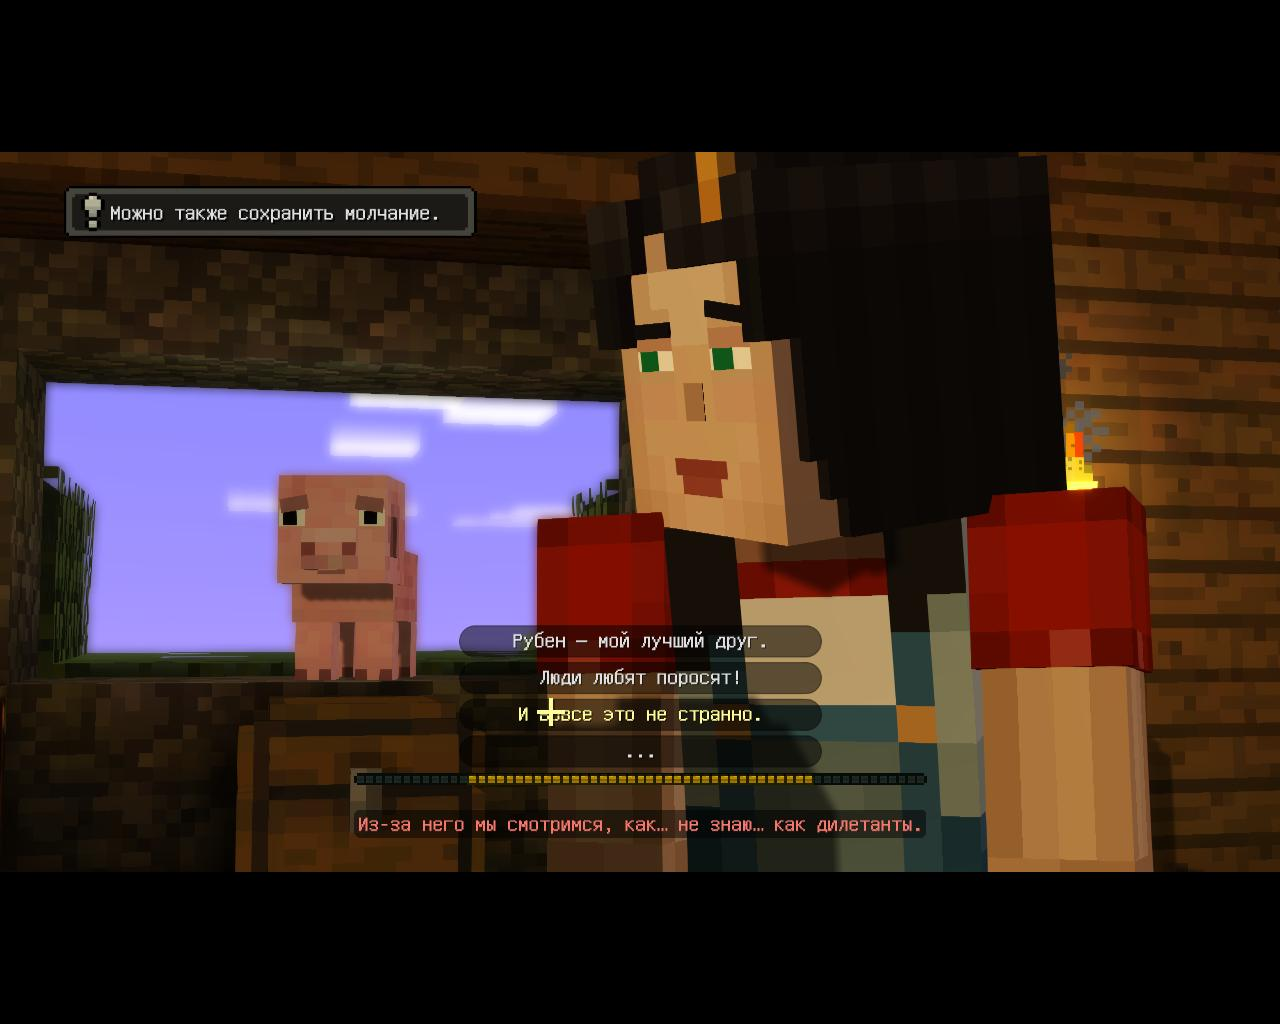 Minecraft: story mode скачать v1. 37 (все эпизоды) на android.